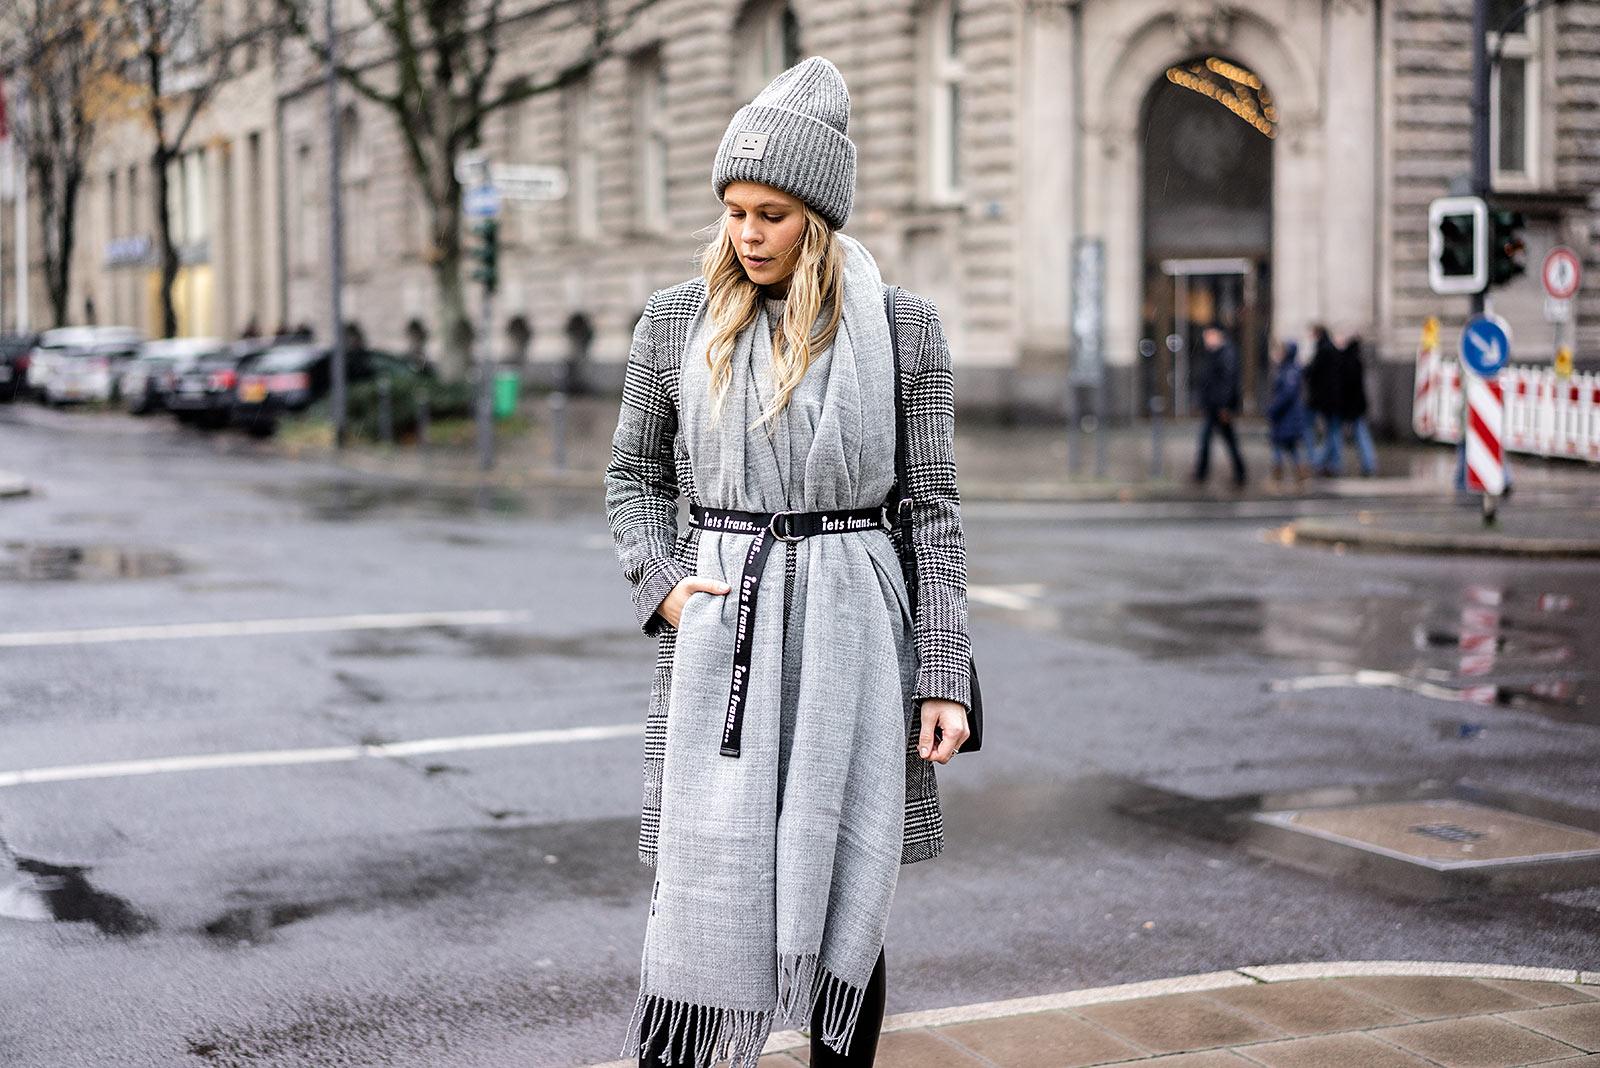 Acne Mütze grau Winter-Accessoires Bloggerin Sunnyinga